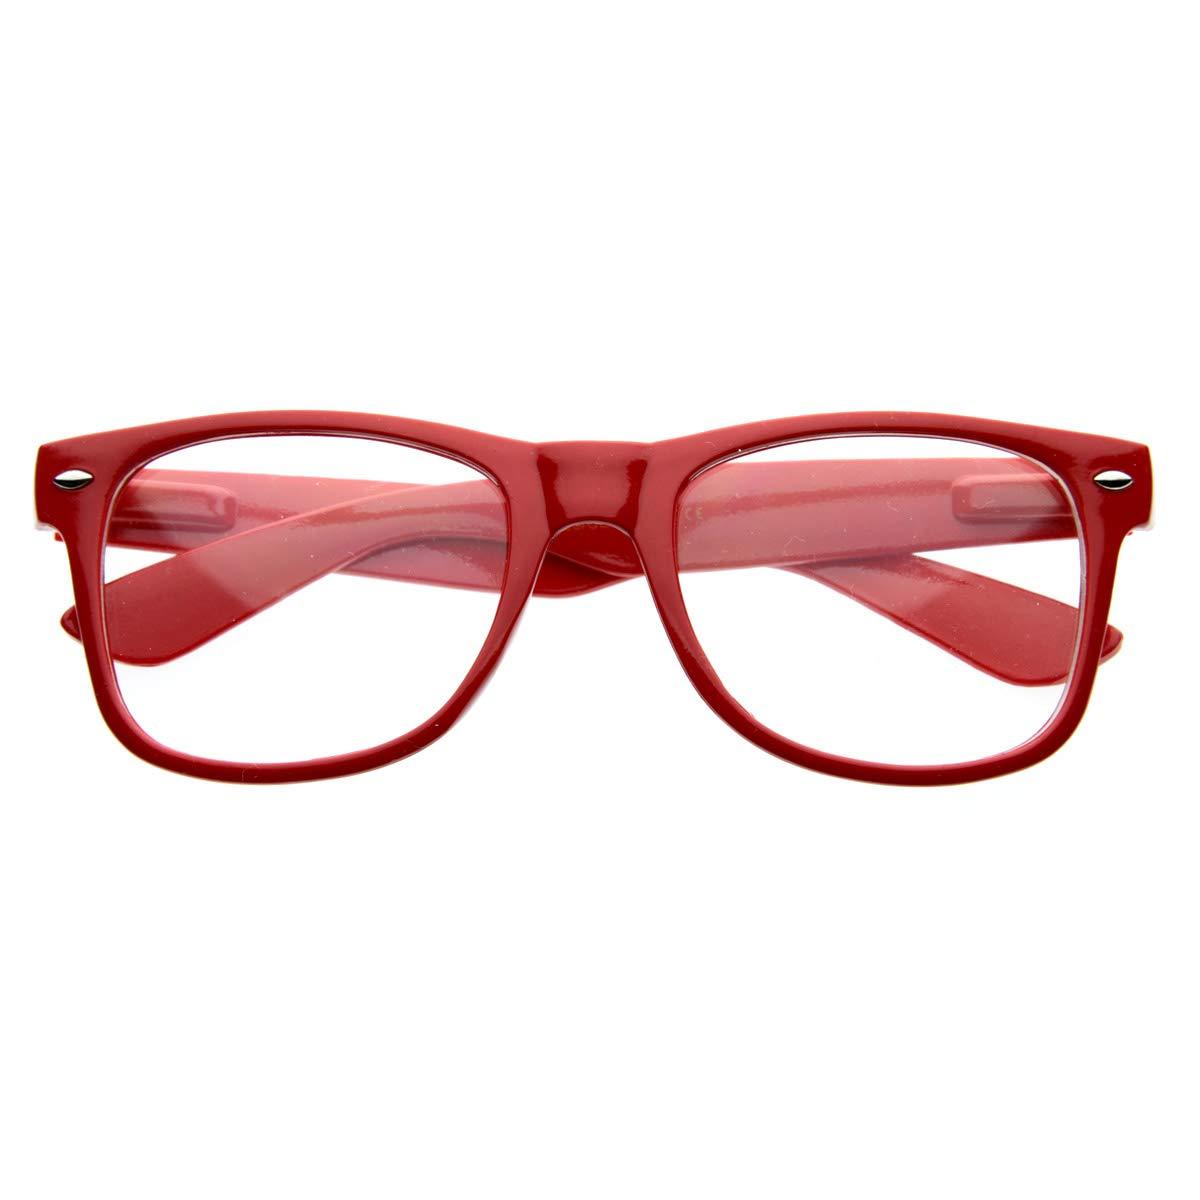 Standard Retro Clear Lens Nerd Geek Assorted Color Horn Rimmed Glasses (Black) frame&optic ZV-2873j